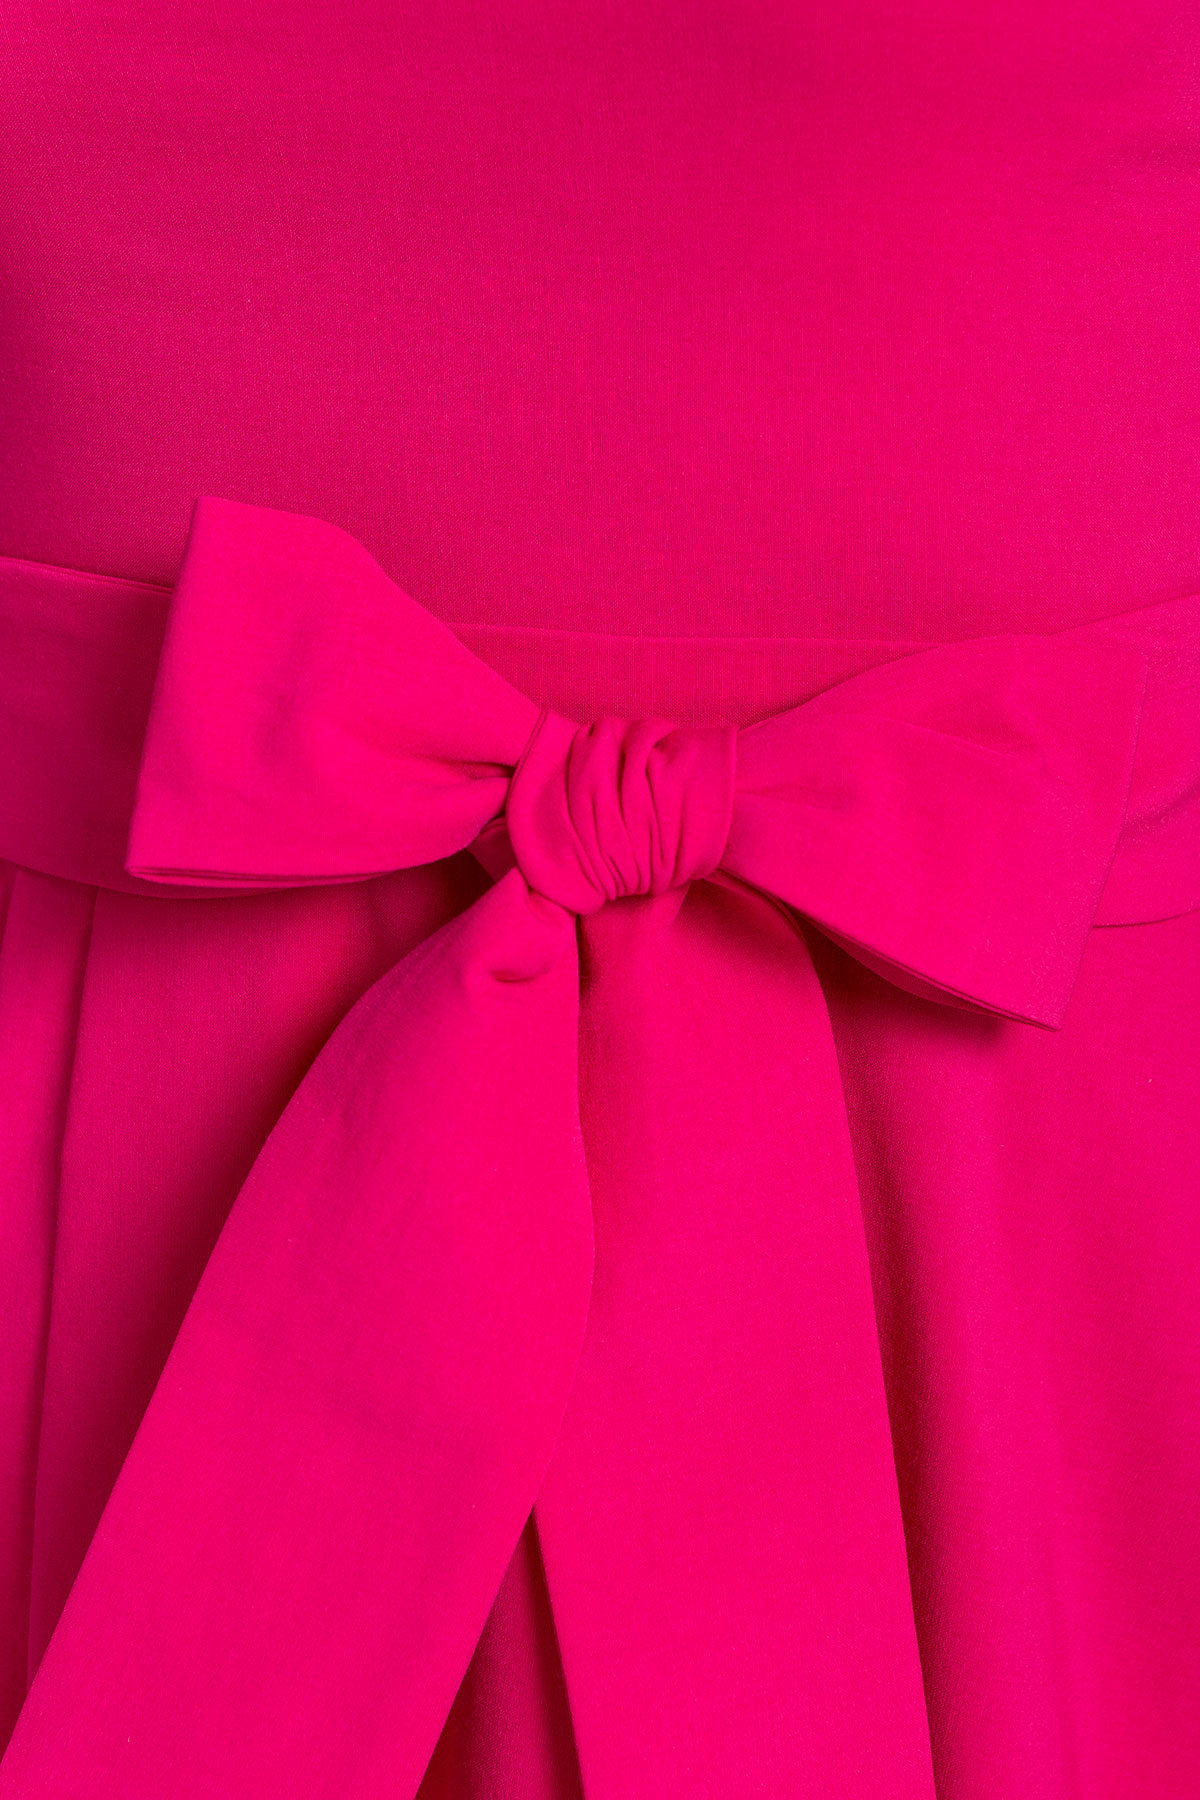 Платье Жадор 5125 АРТ. 35982 Цвет: Фуксия - фото 4, интернет магазин tm-modus.ru